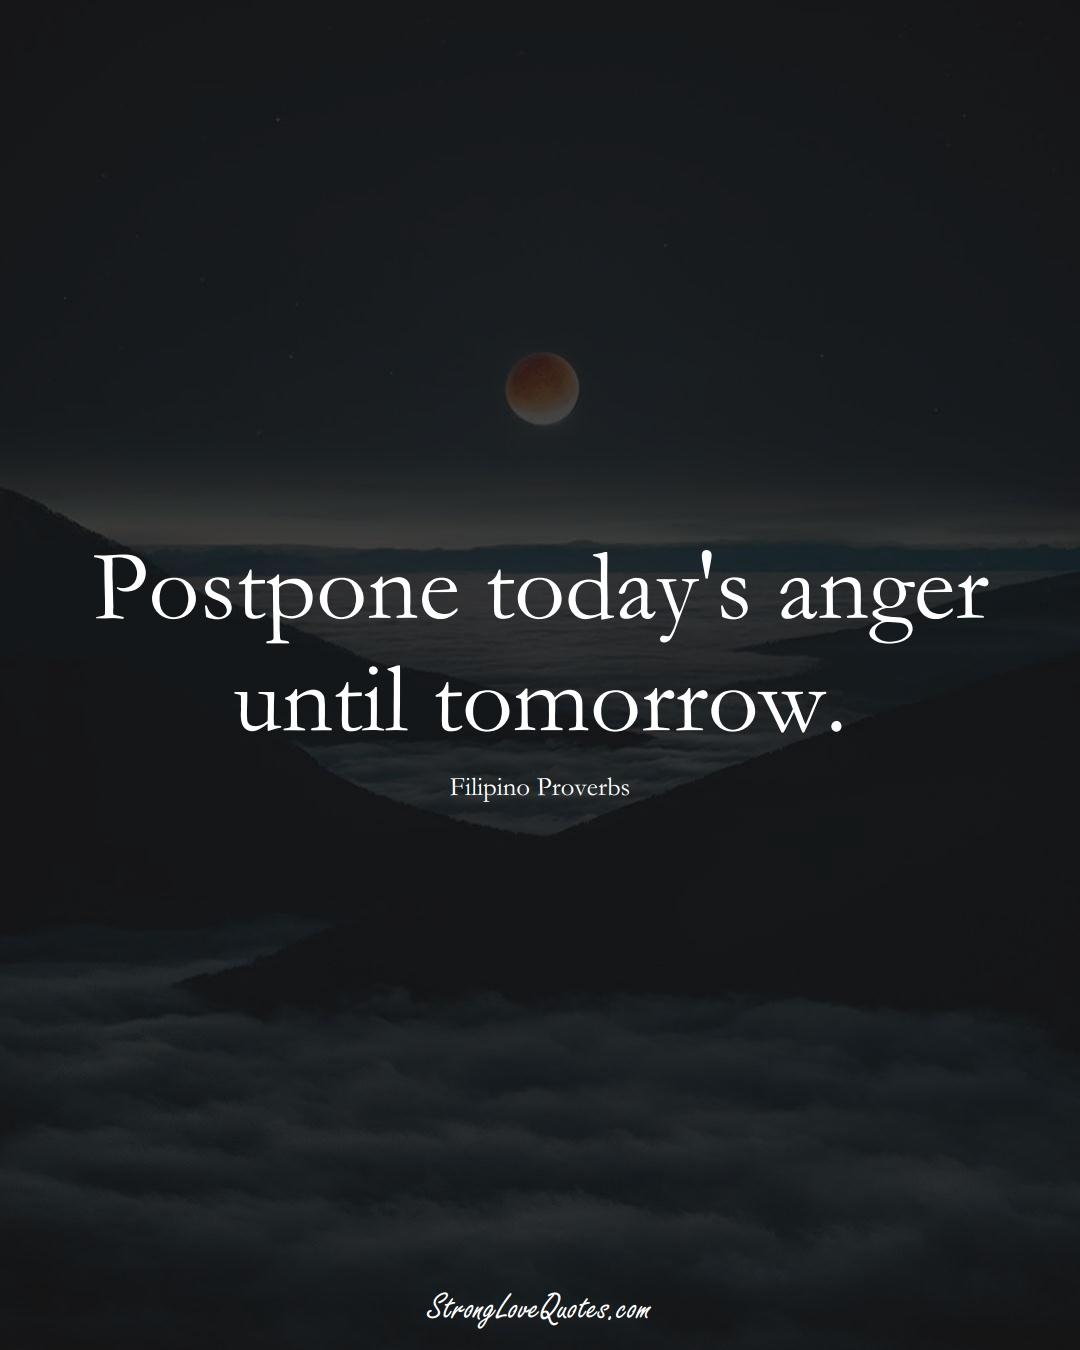 Postpone today's anger until tomorrow. (Filipino Sayings);  #AsianSayings